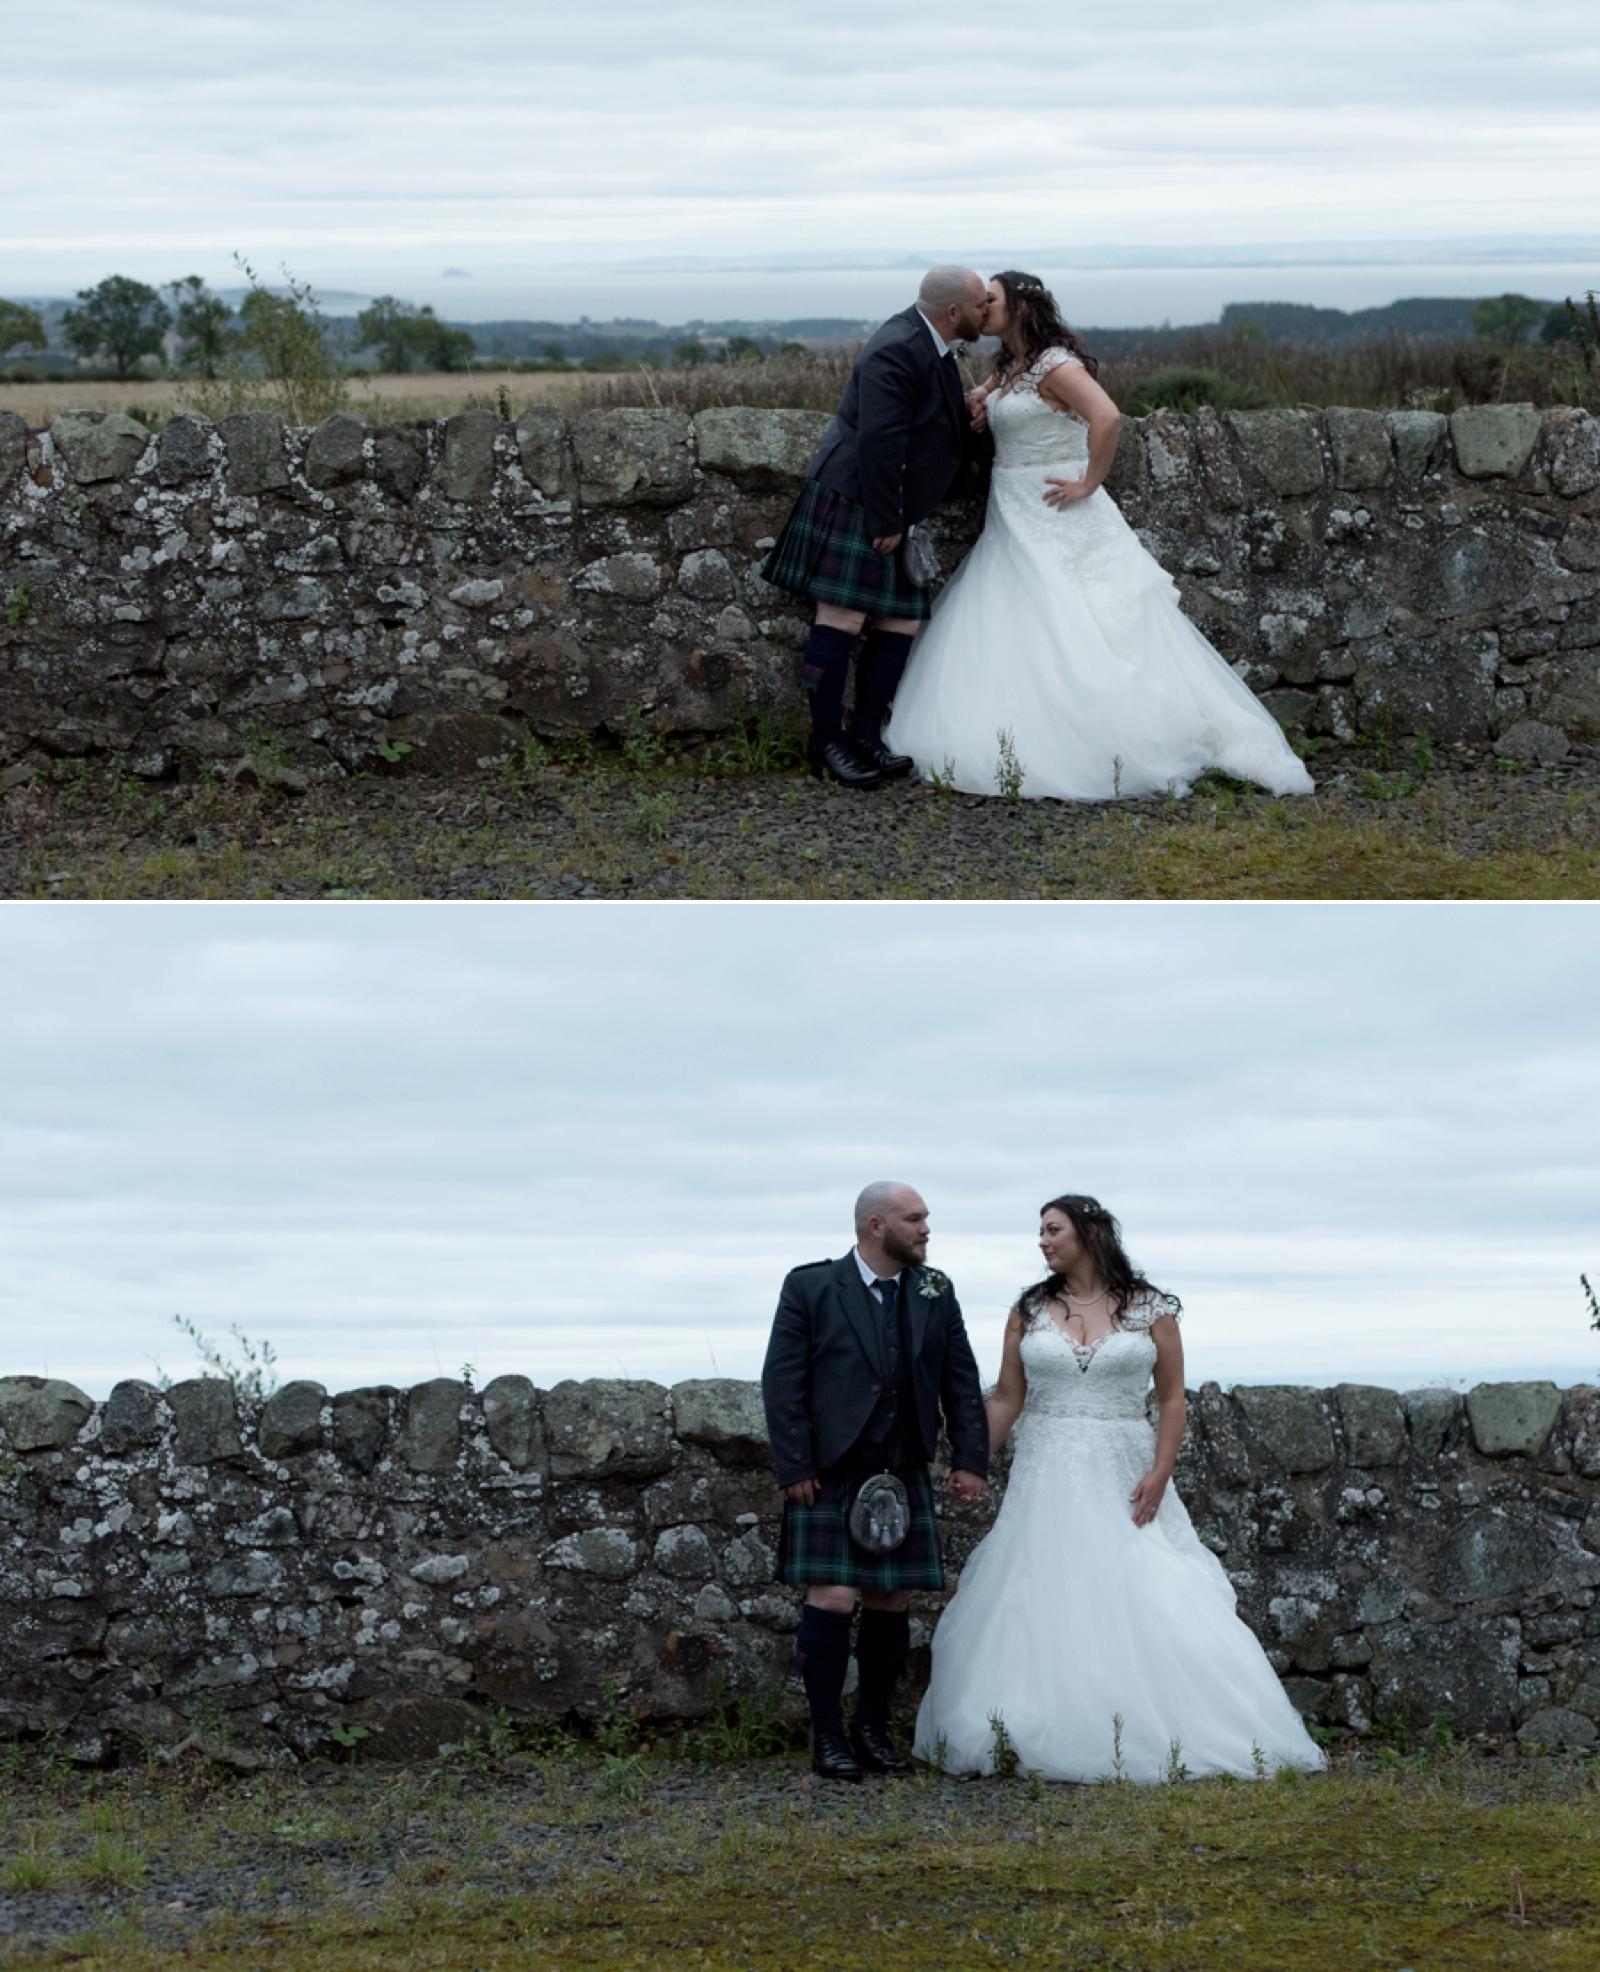 2017-09-23 (Mearns) Pratis Farm Wedding Photography190317.jpg